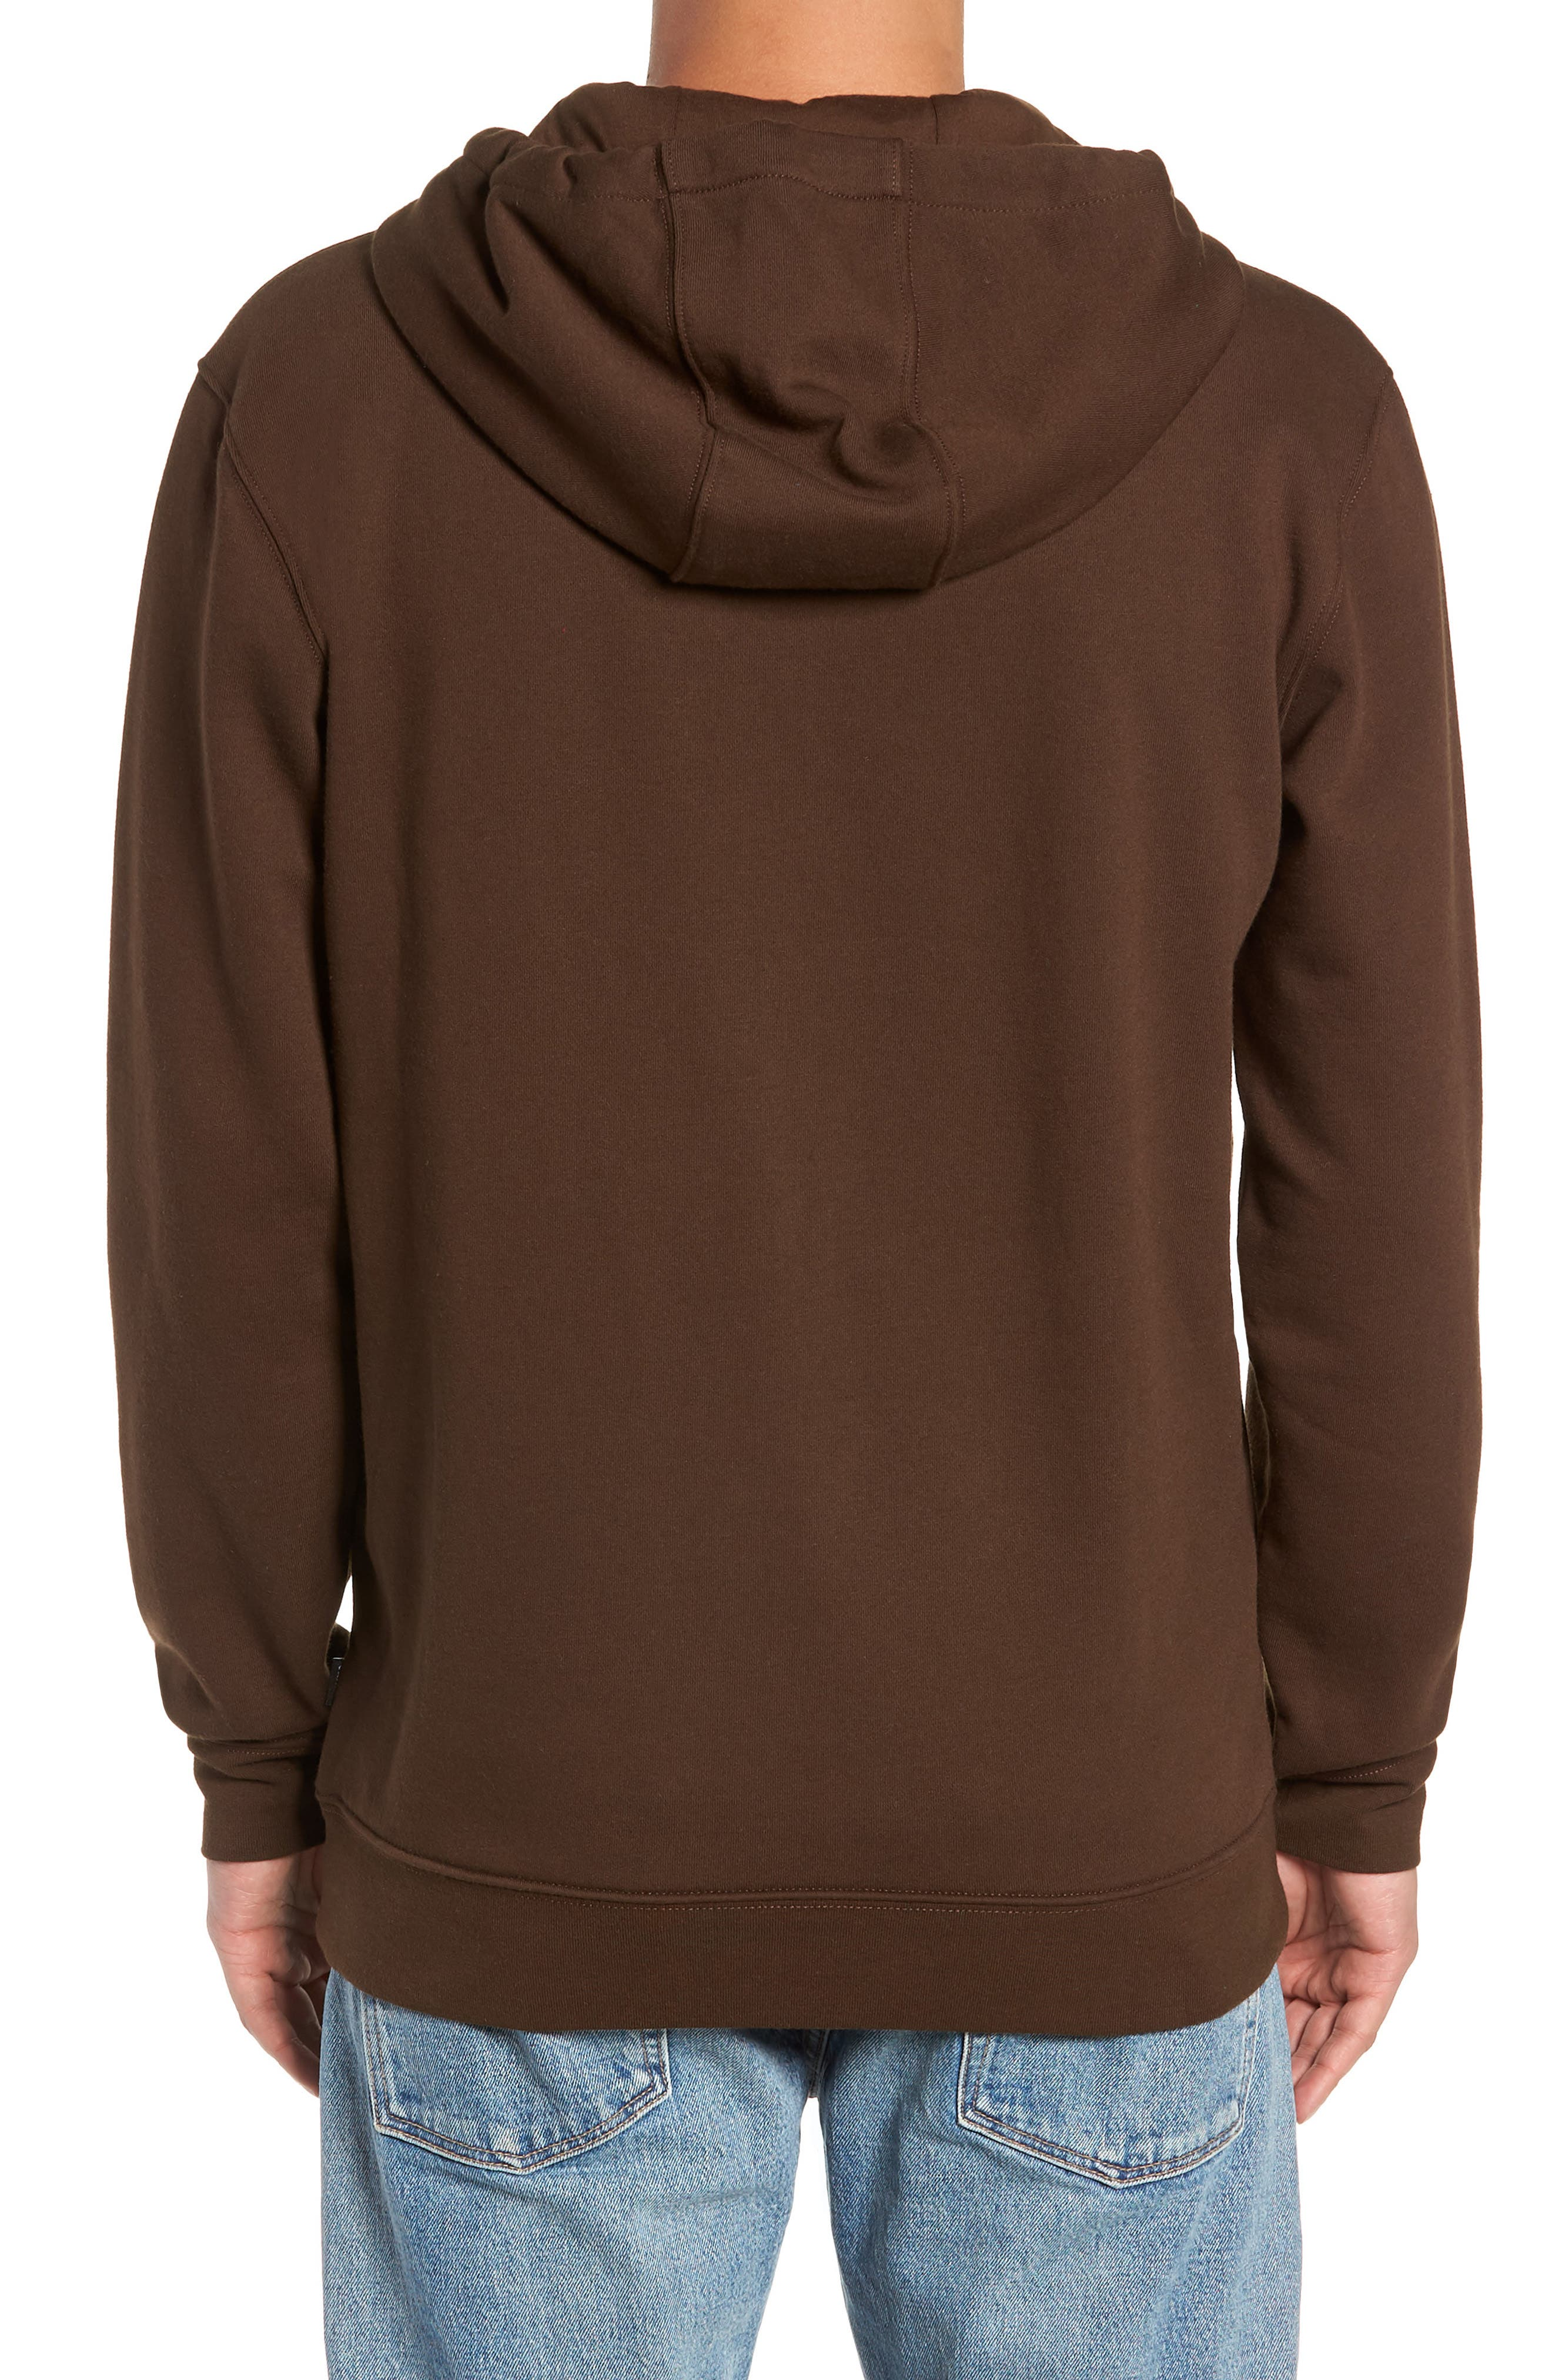 Easy Box Embroidered Hooded Sweatshirt,                             Alternate thumbnail 2, color,                             DEMITASSE